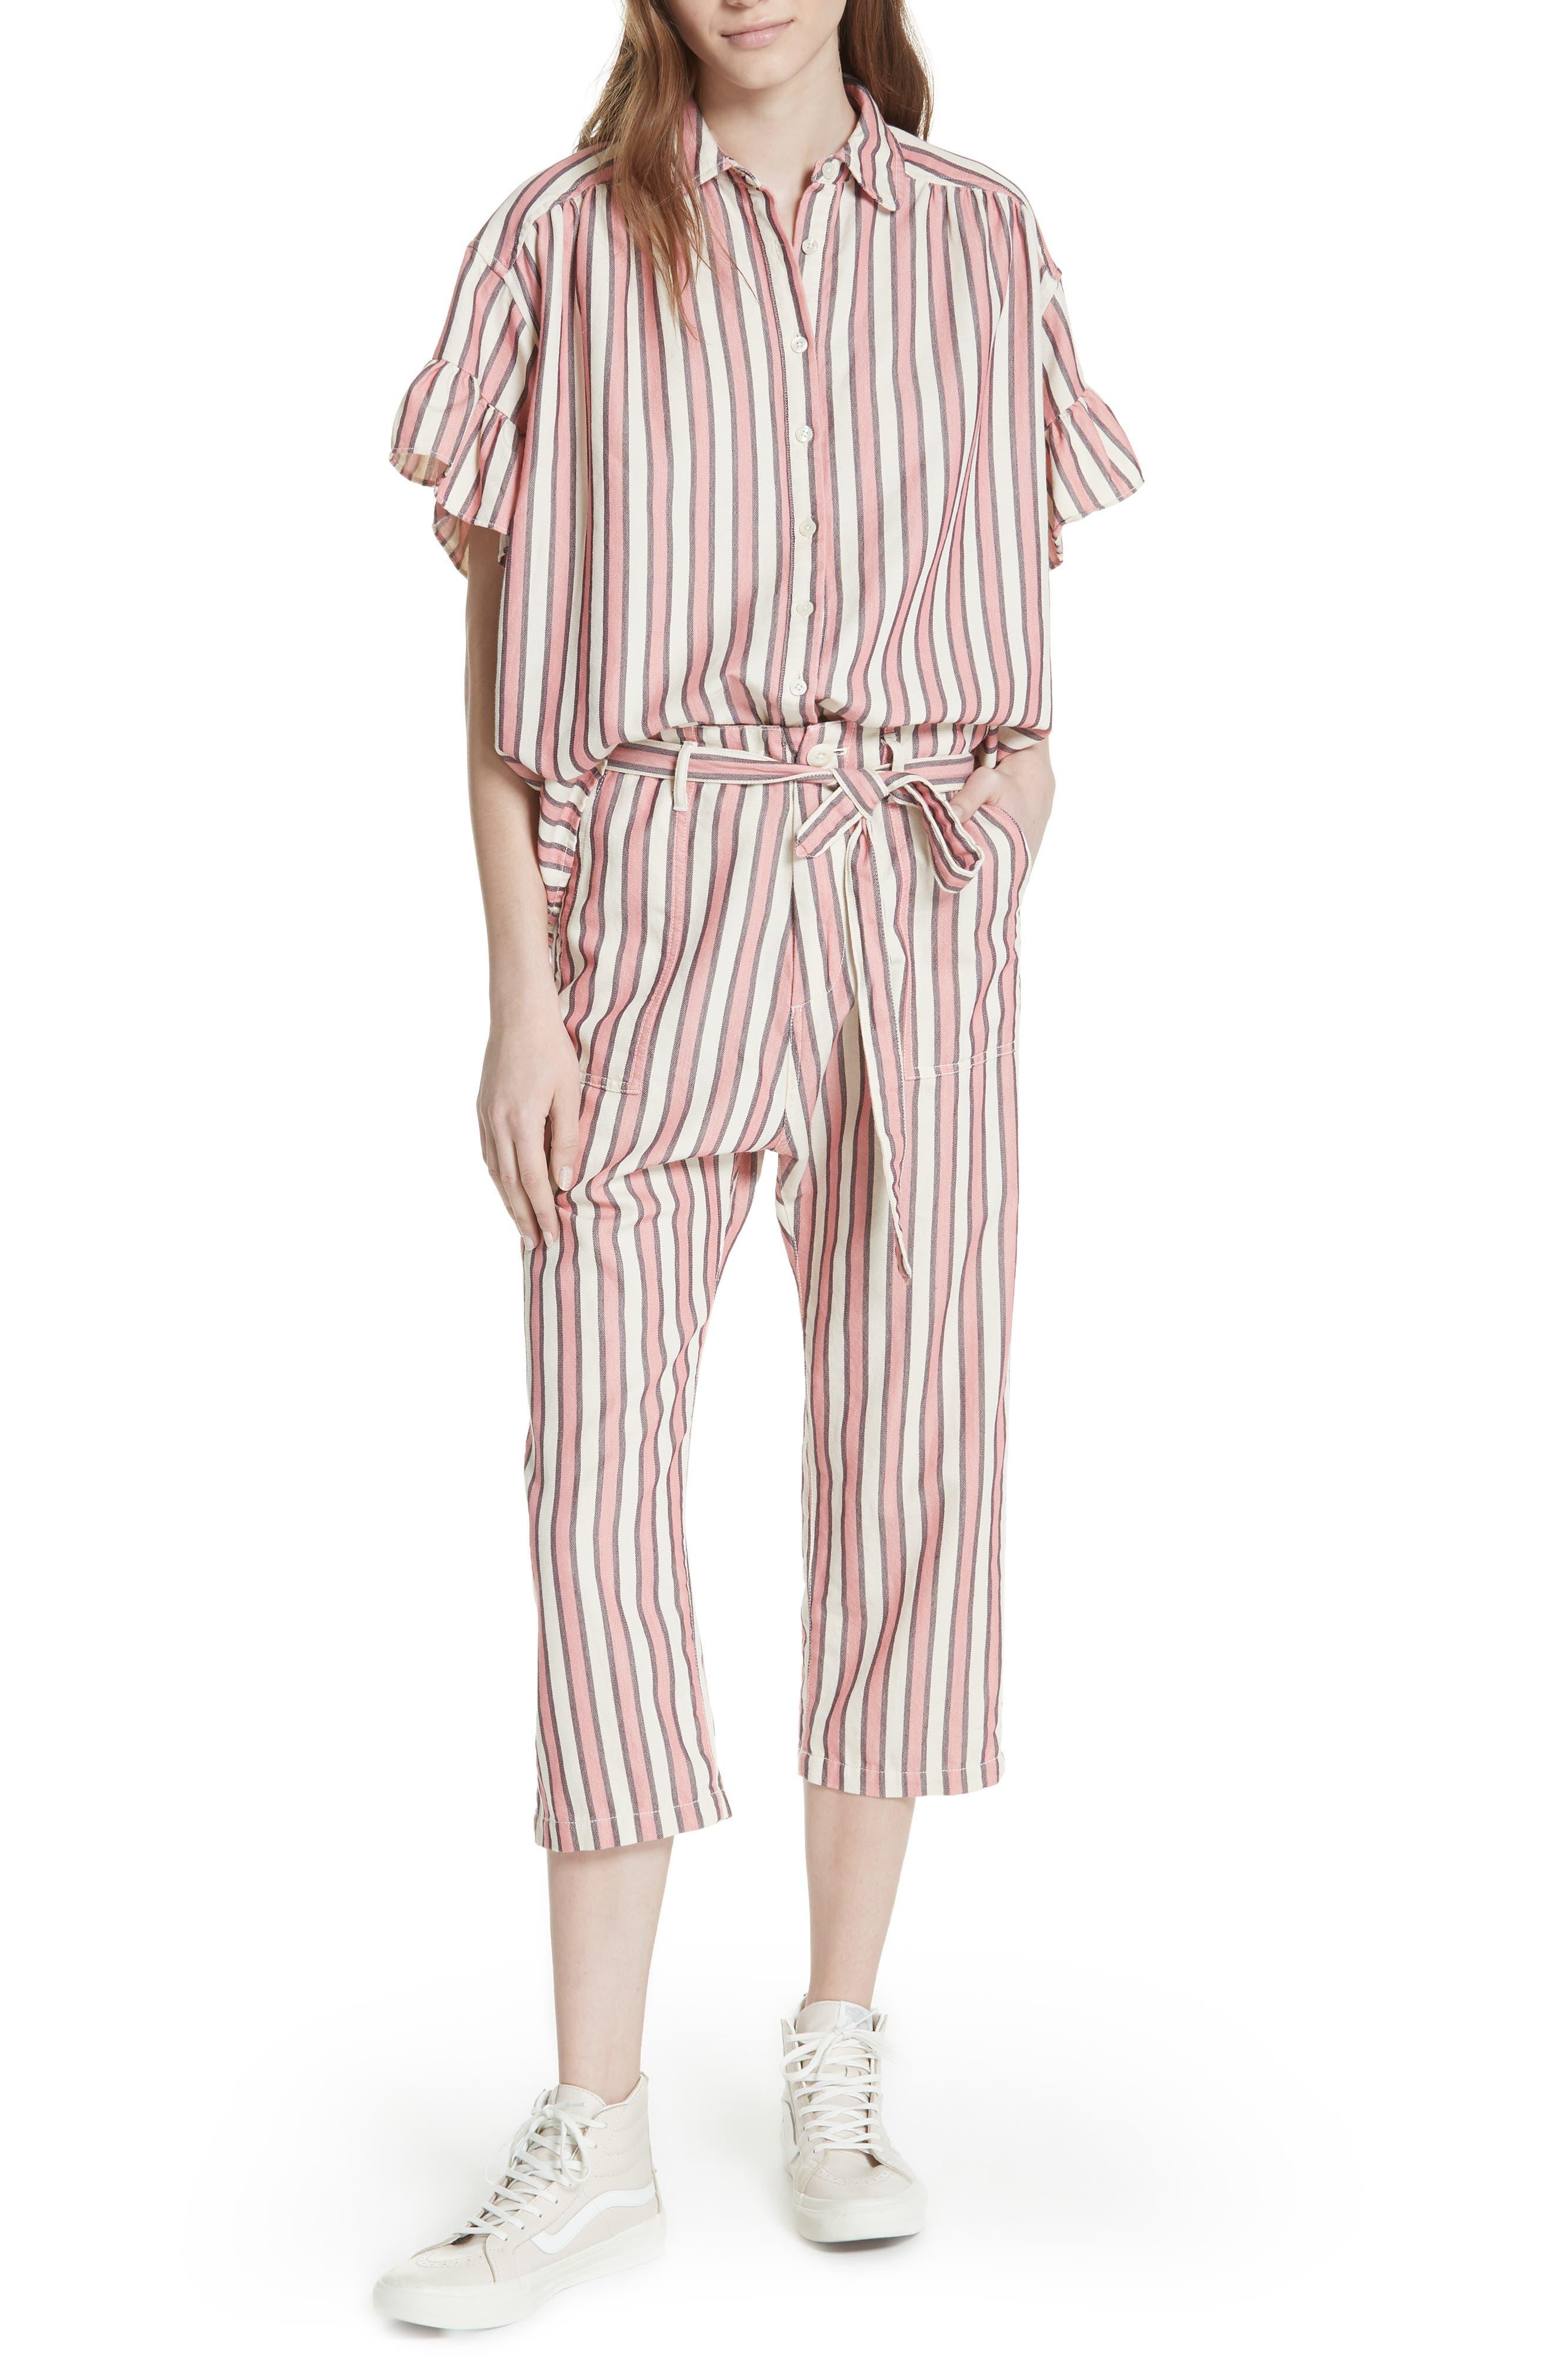 Flutter Sleeve Stripe Shirt,                             Alternate thumbnail 8, color,                             Pink Taffy Stripe